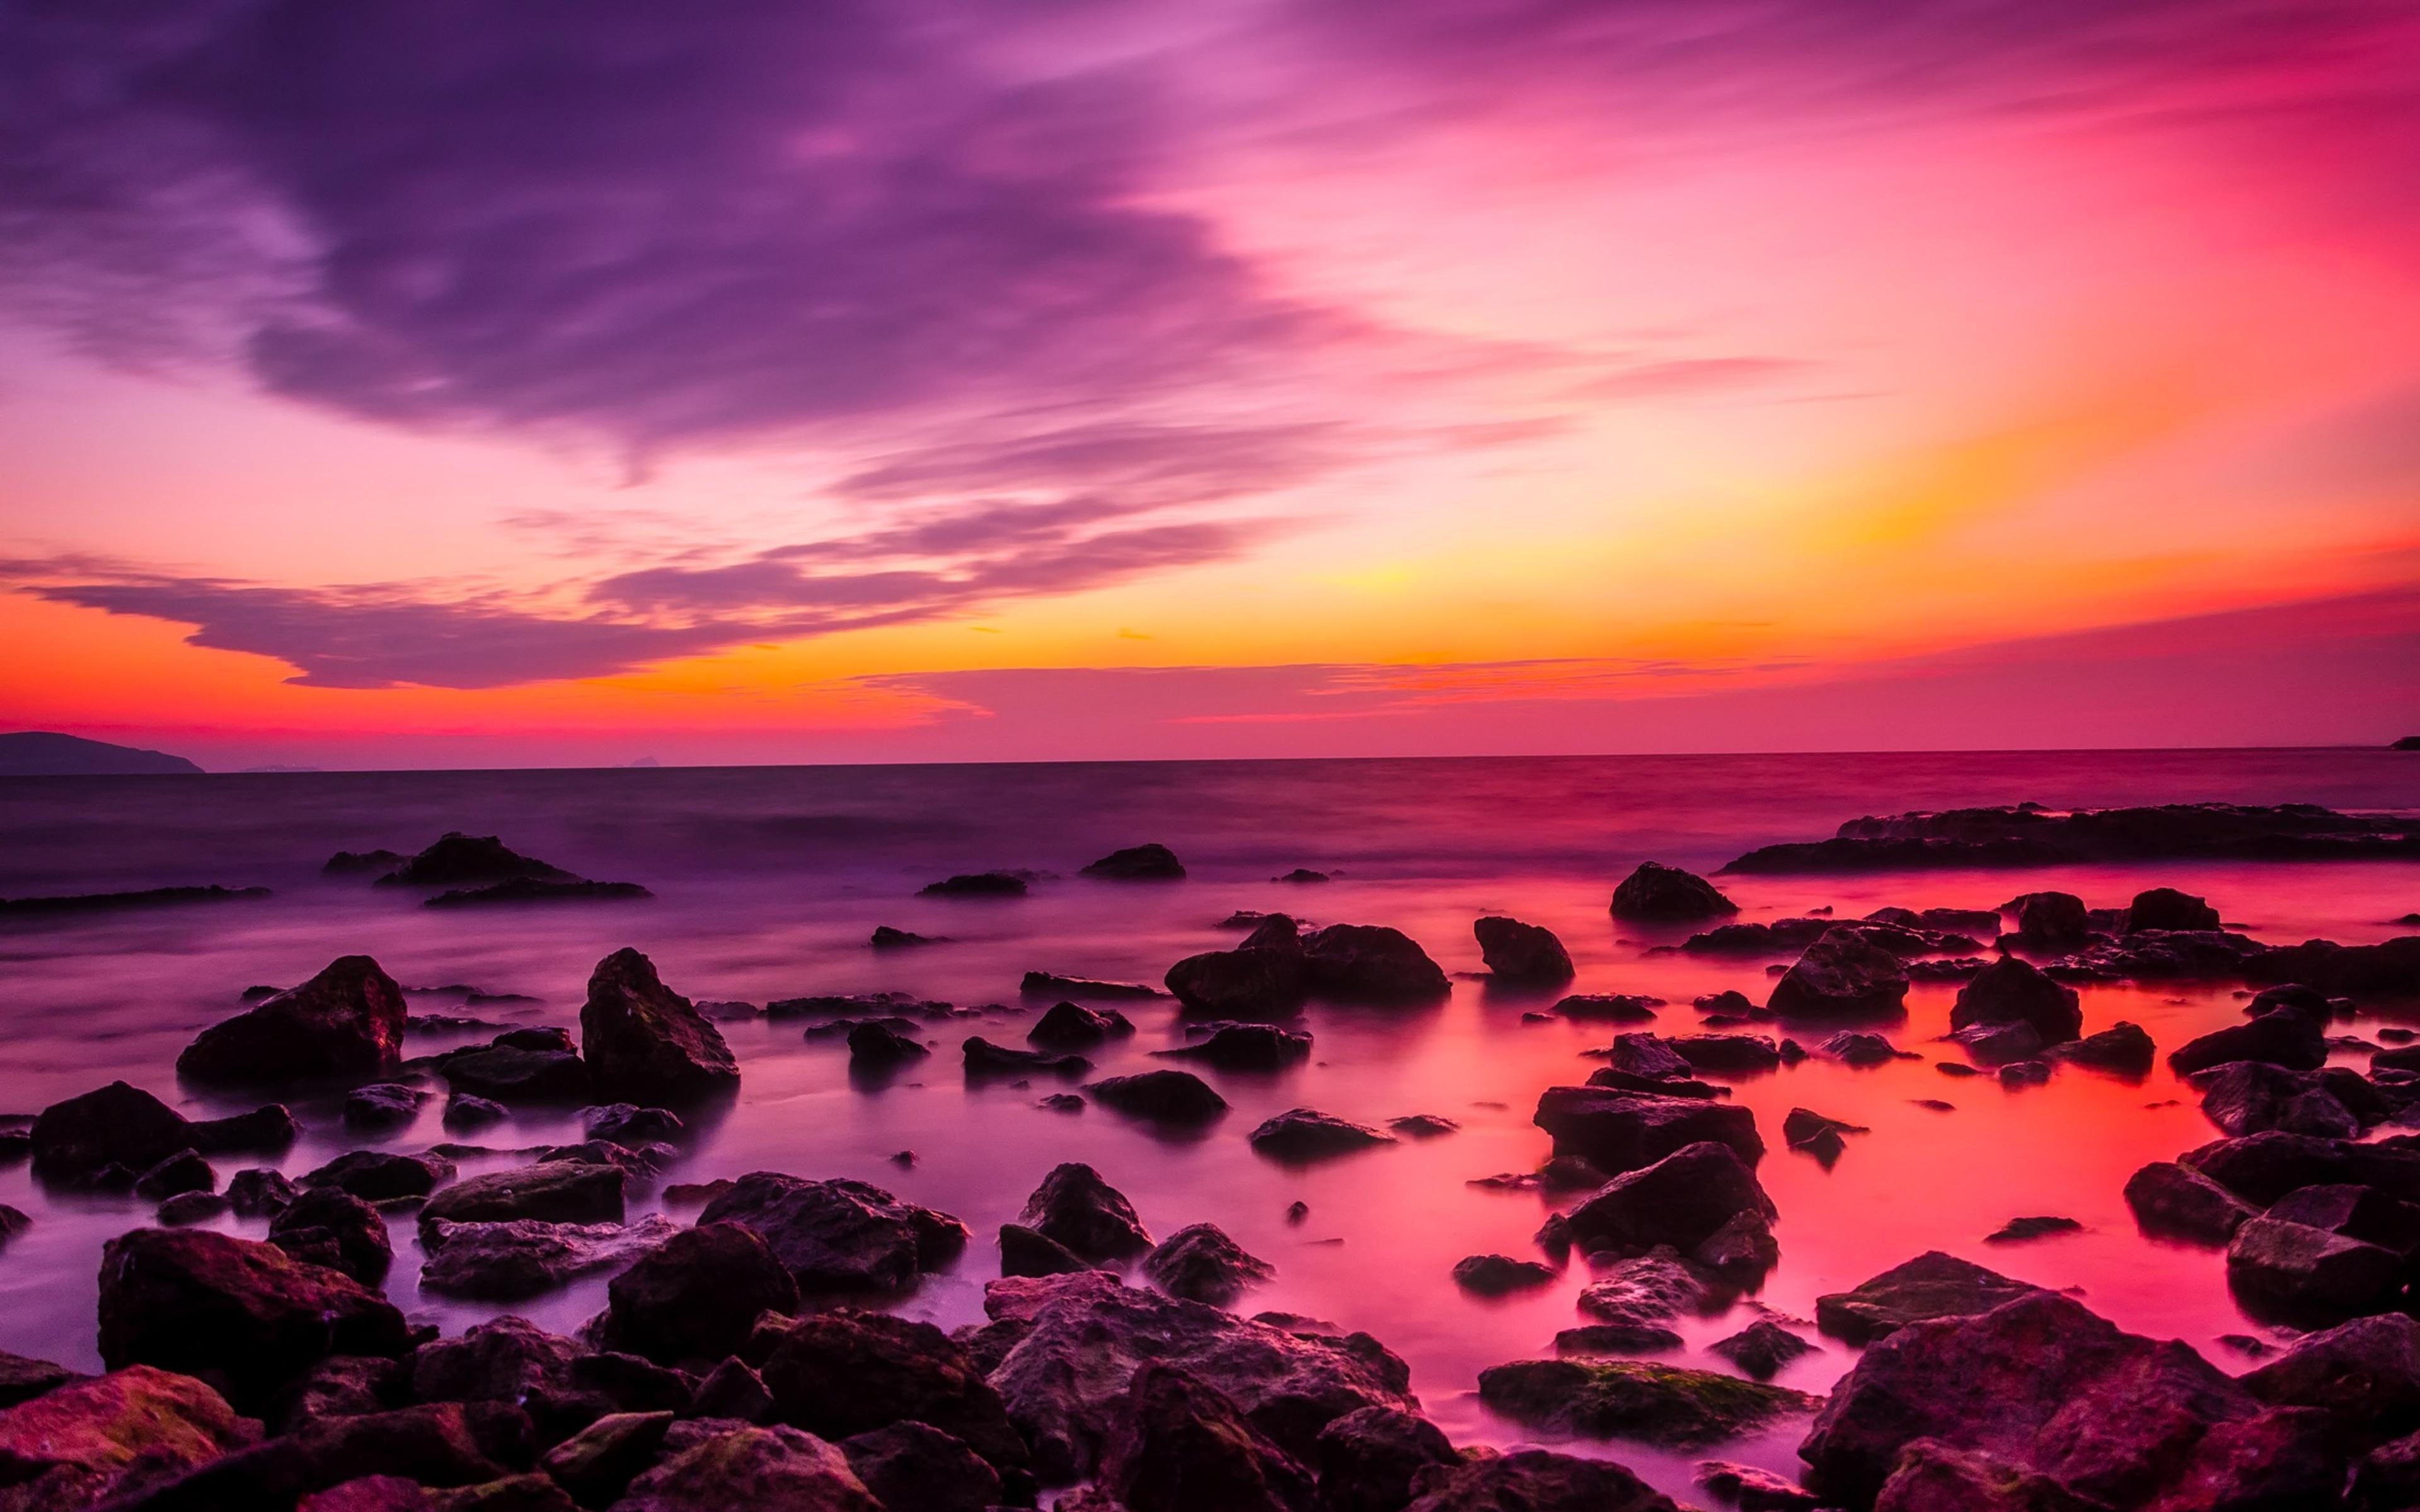 3840x2400 Turkey Sunset Dusk Sky Clouds Rocks 4k Hd 4k